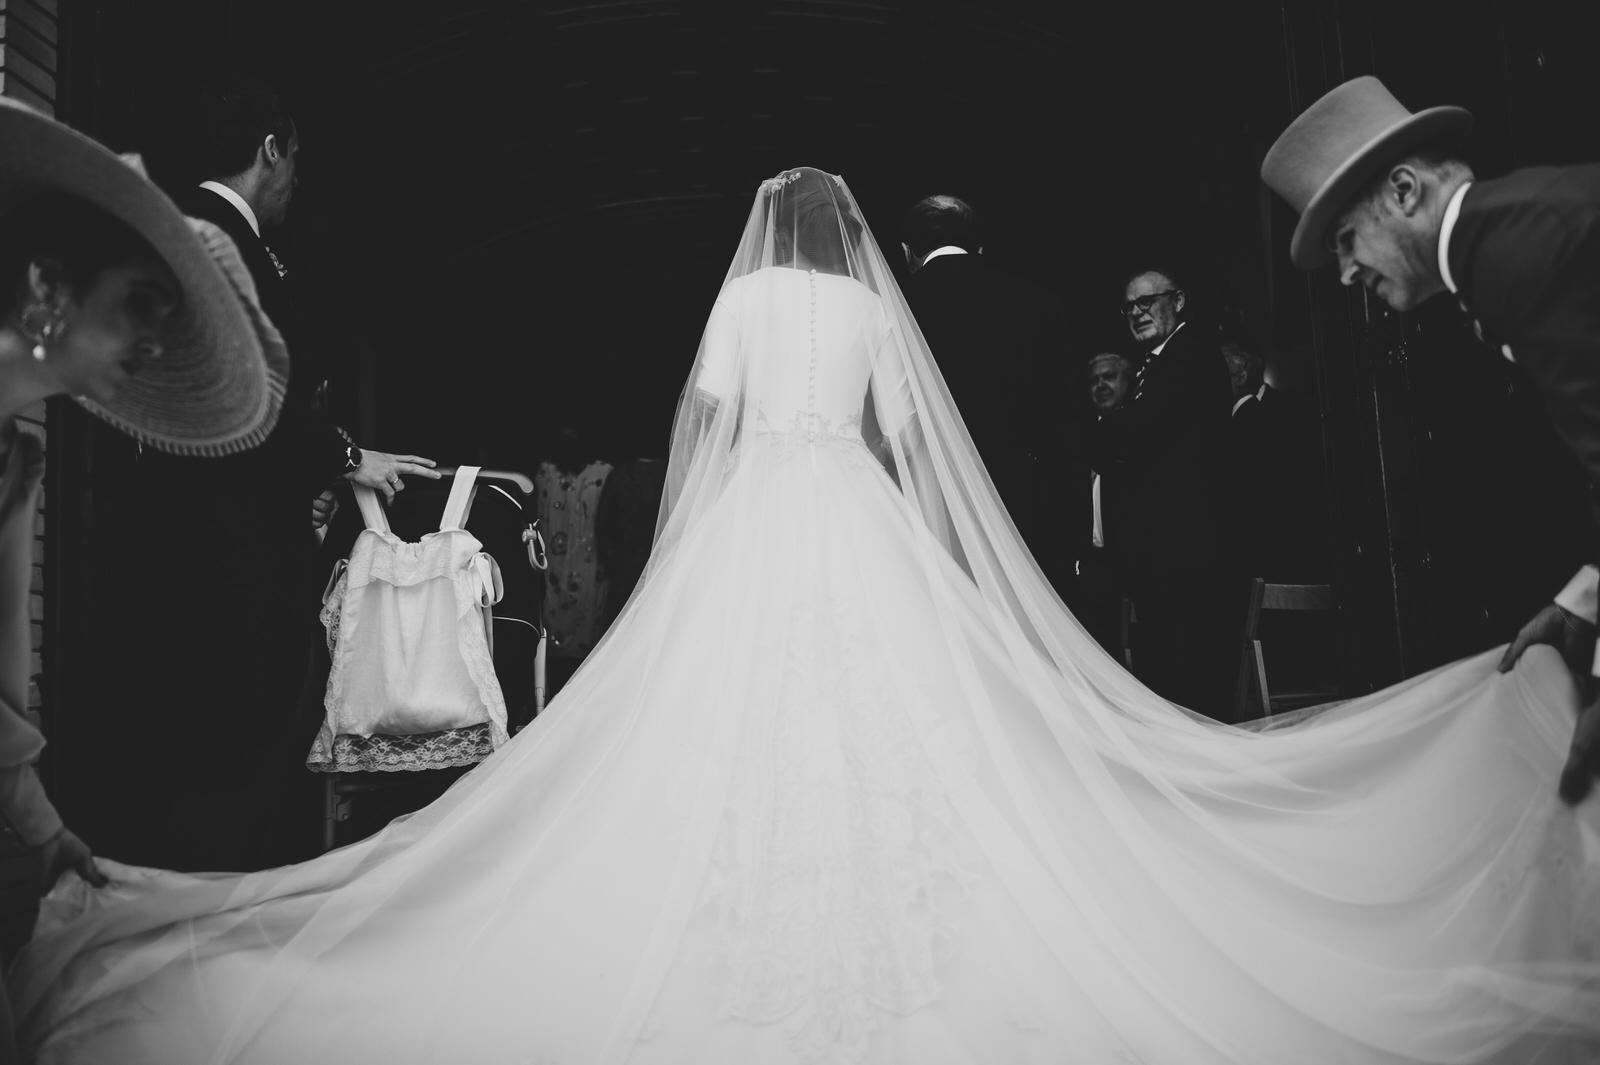 Judith & Gabriel - Boda en Olivares - Albaida, Fotógrafo de boda Andrés Amarillo - 24.JPG